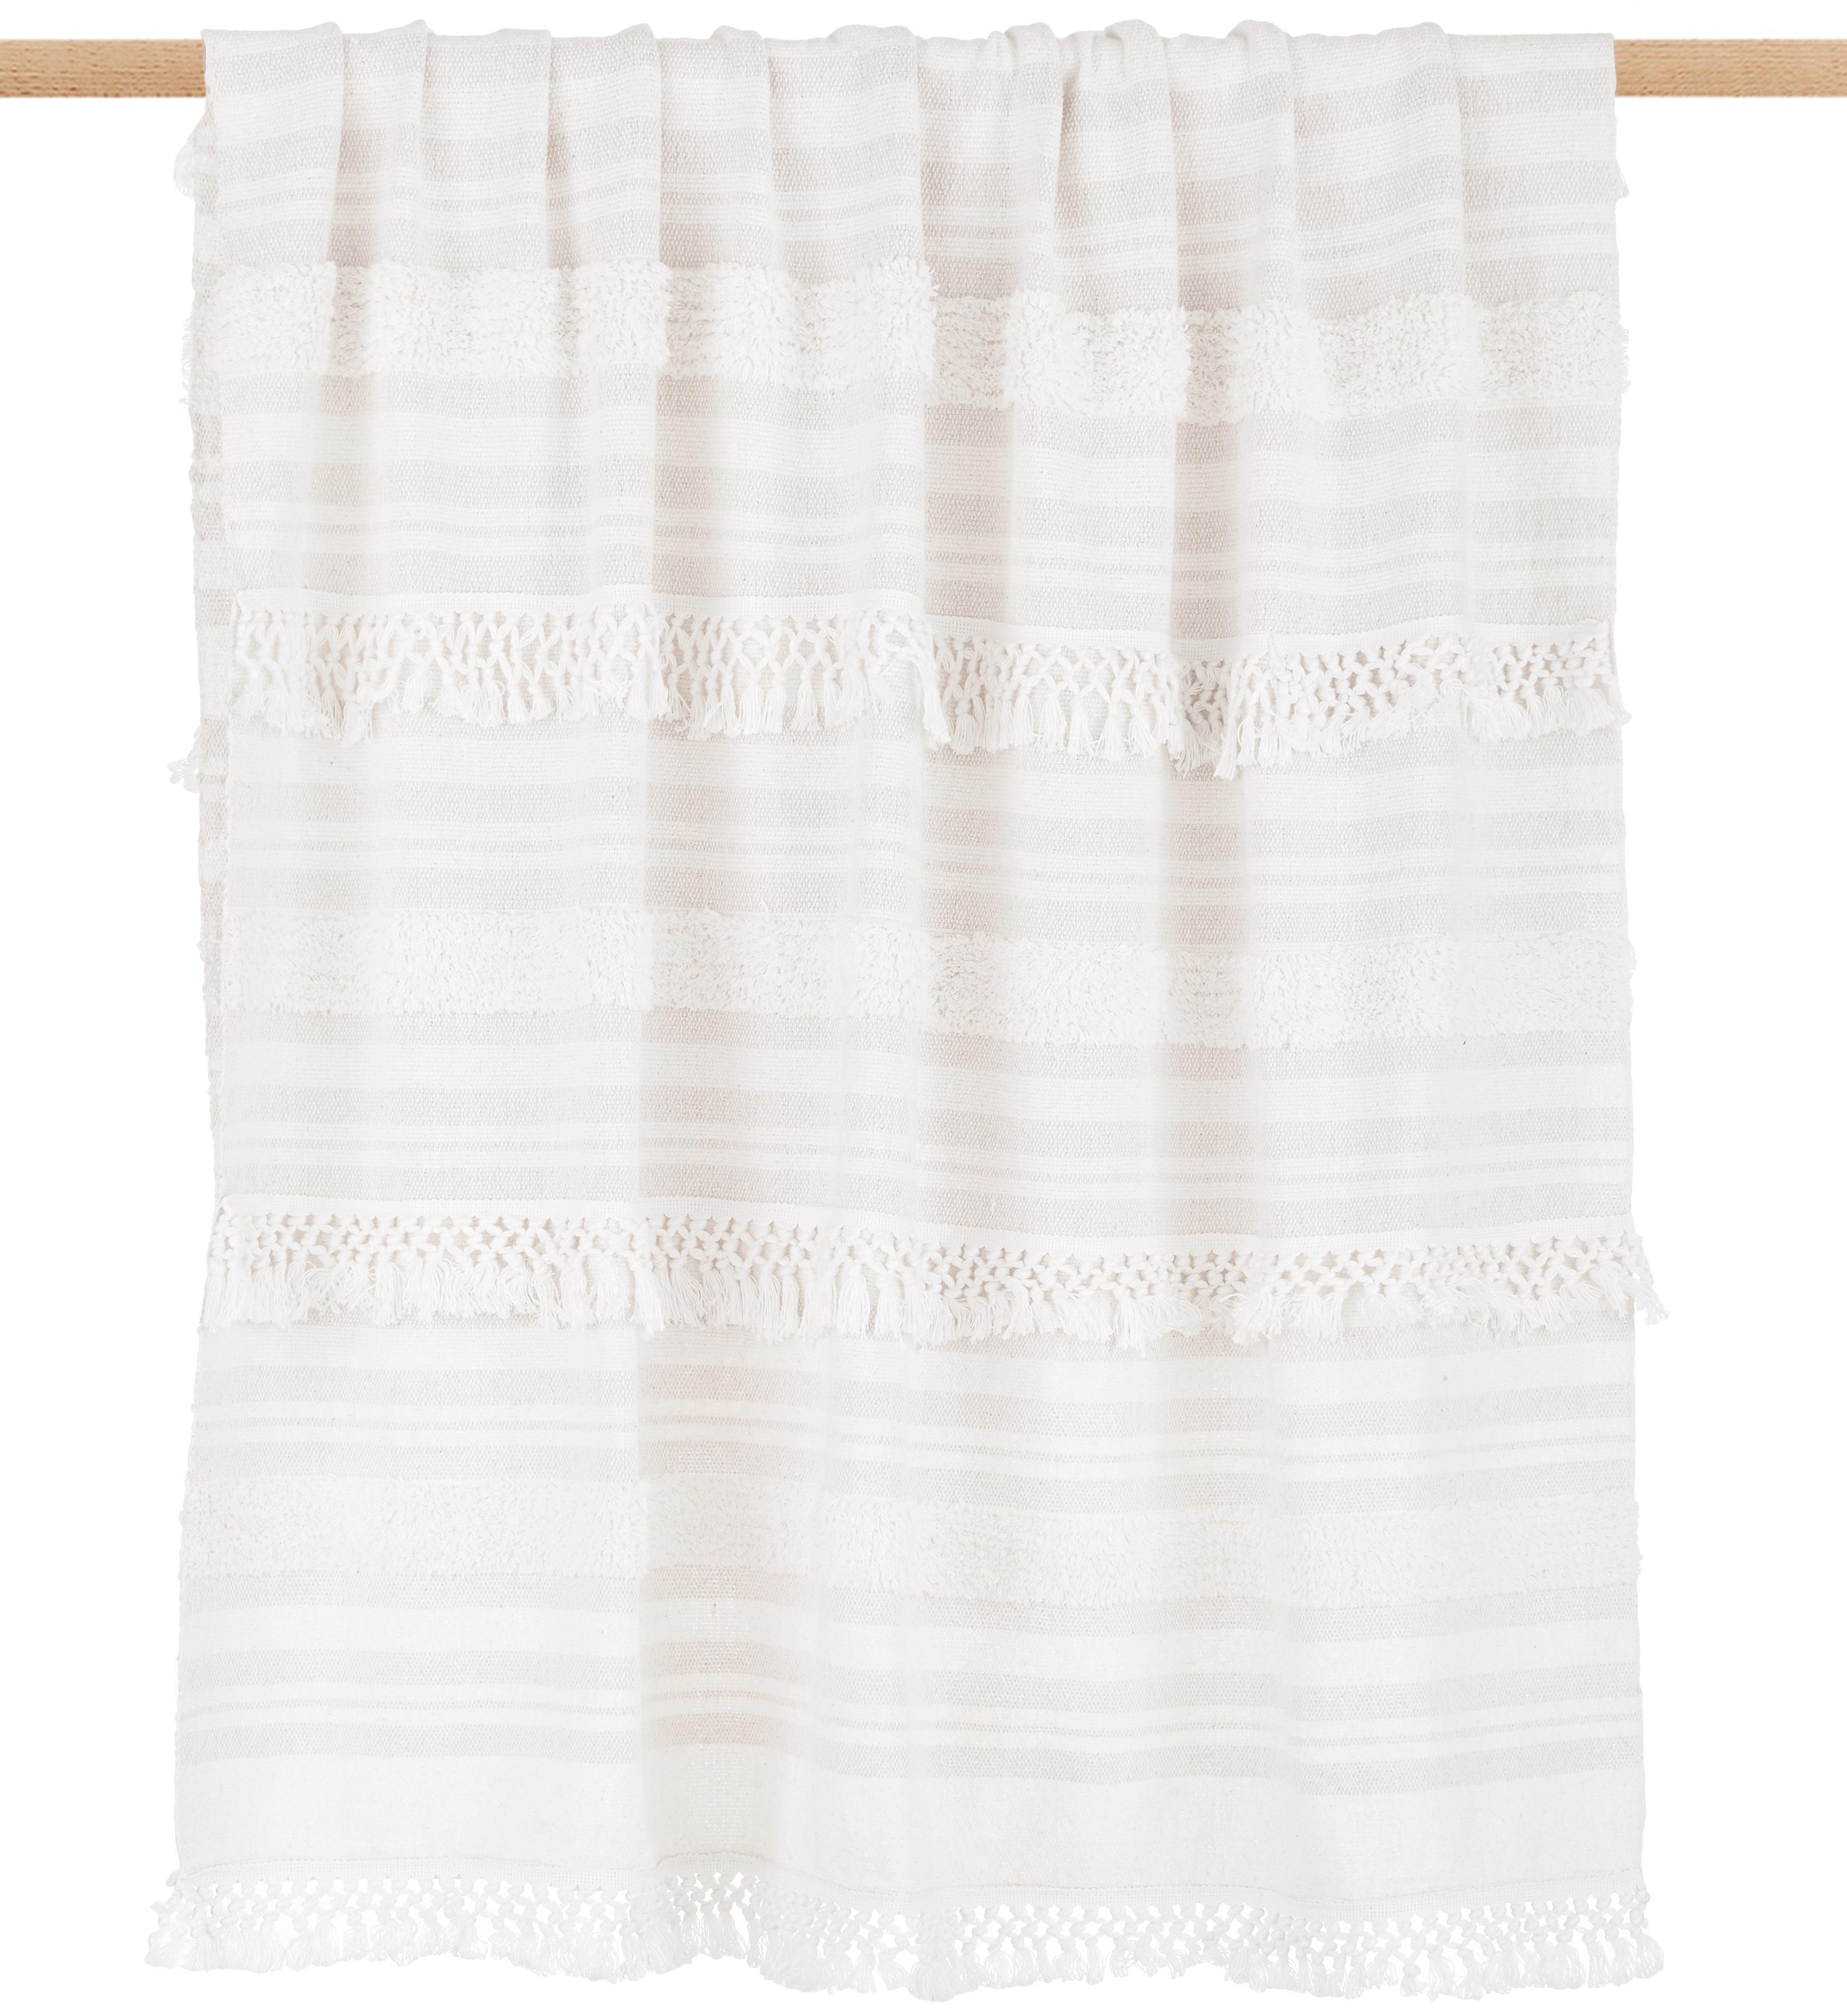 Plaid in cotone Nara, 100% cotone, Bianco crema, beige, Larg. 130 x Lung. 170 cm